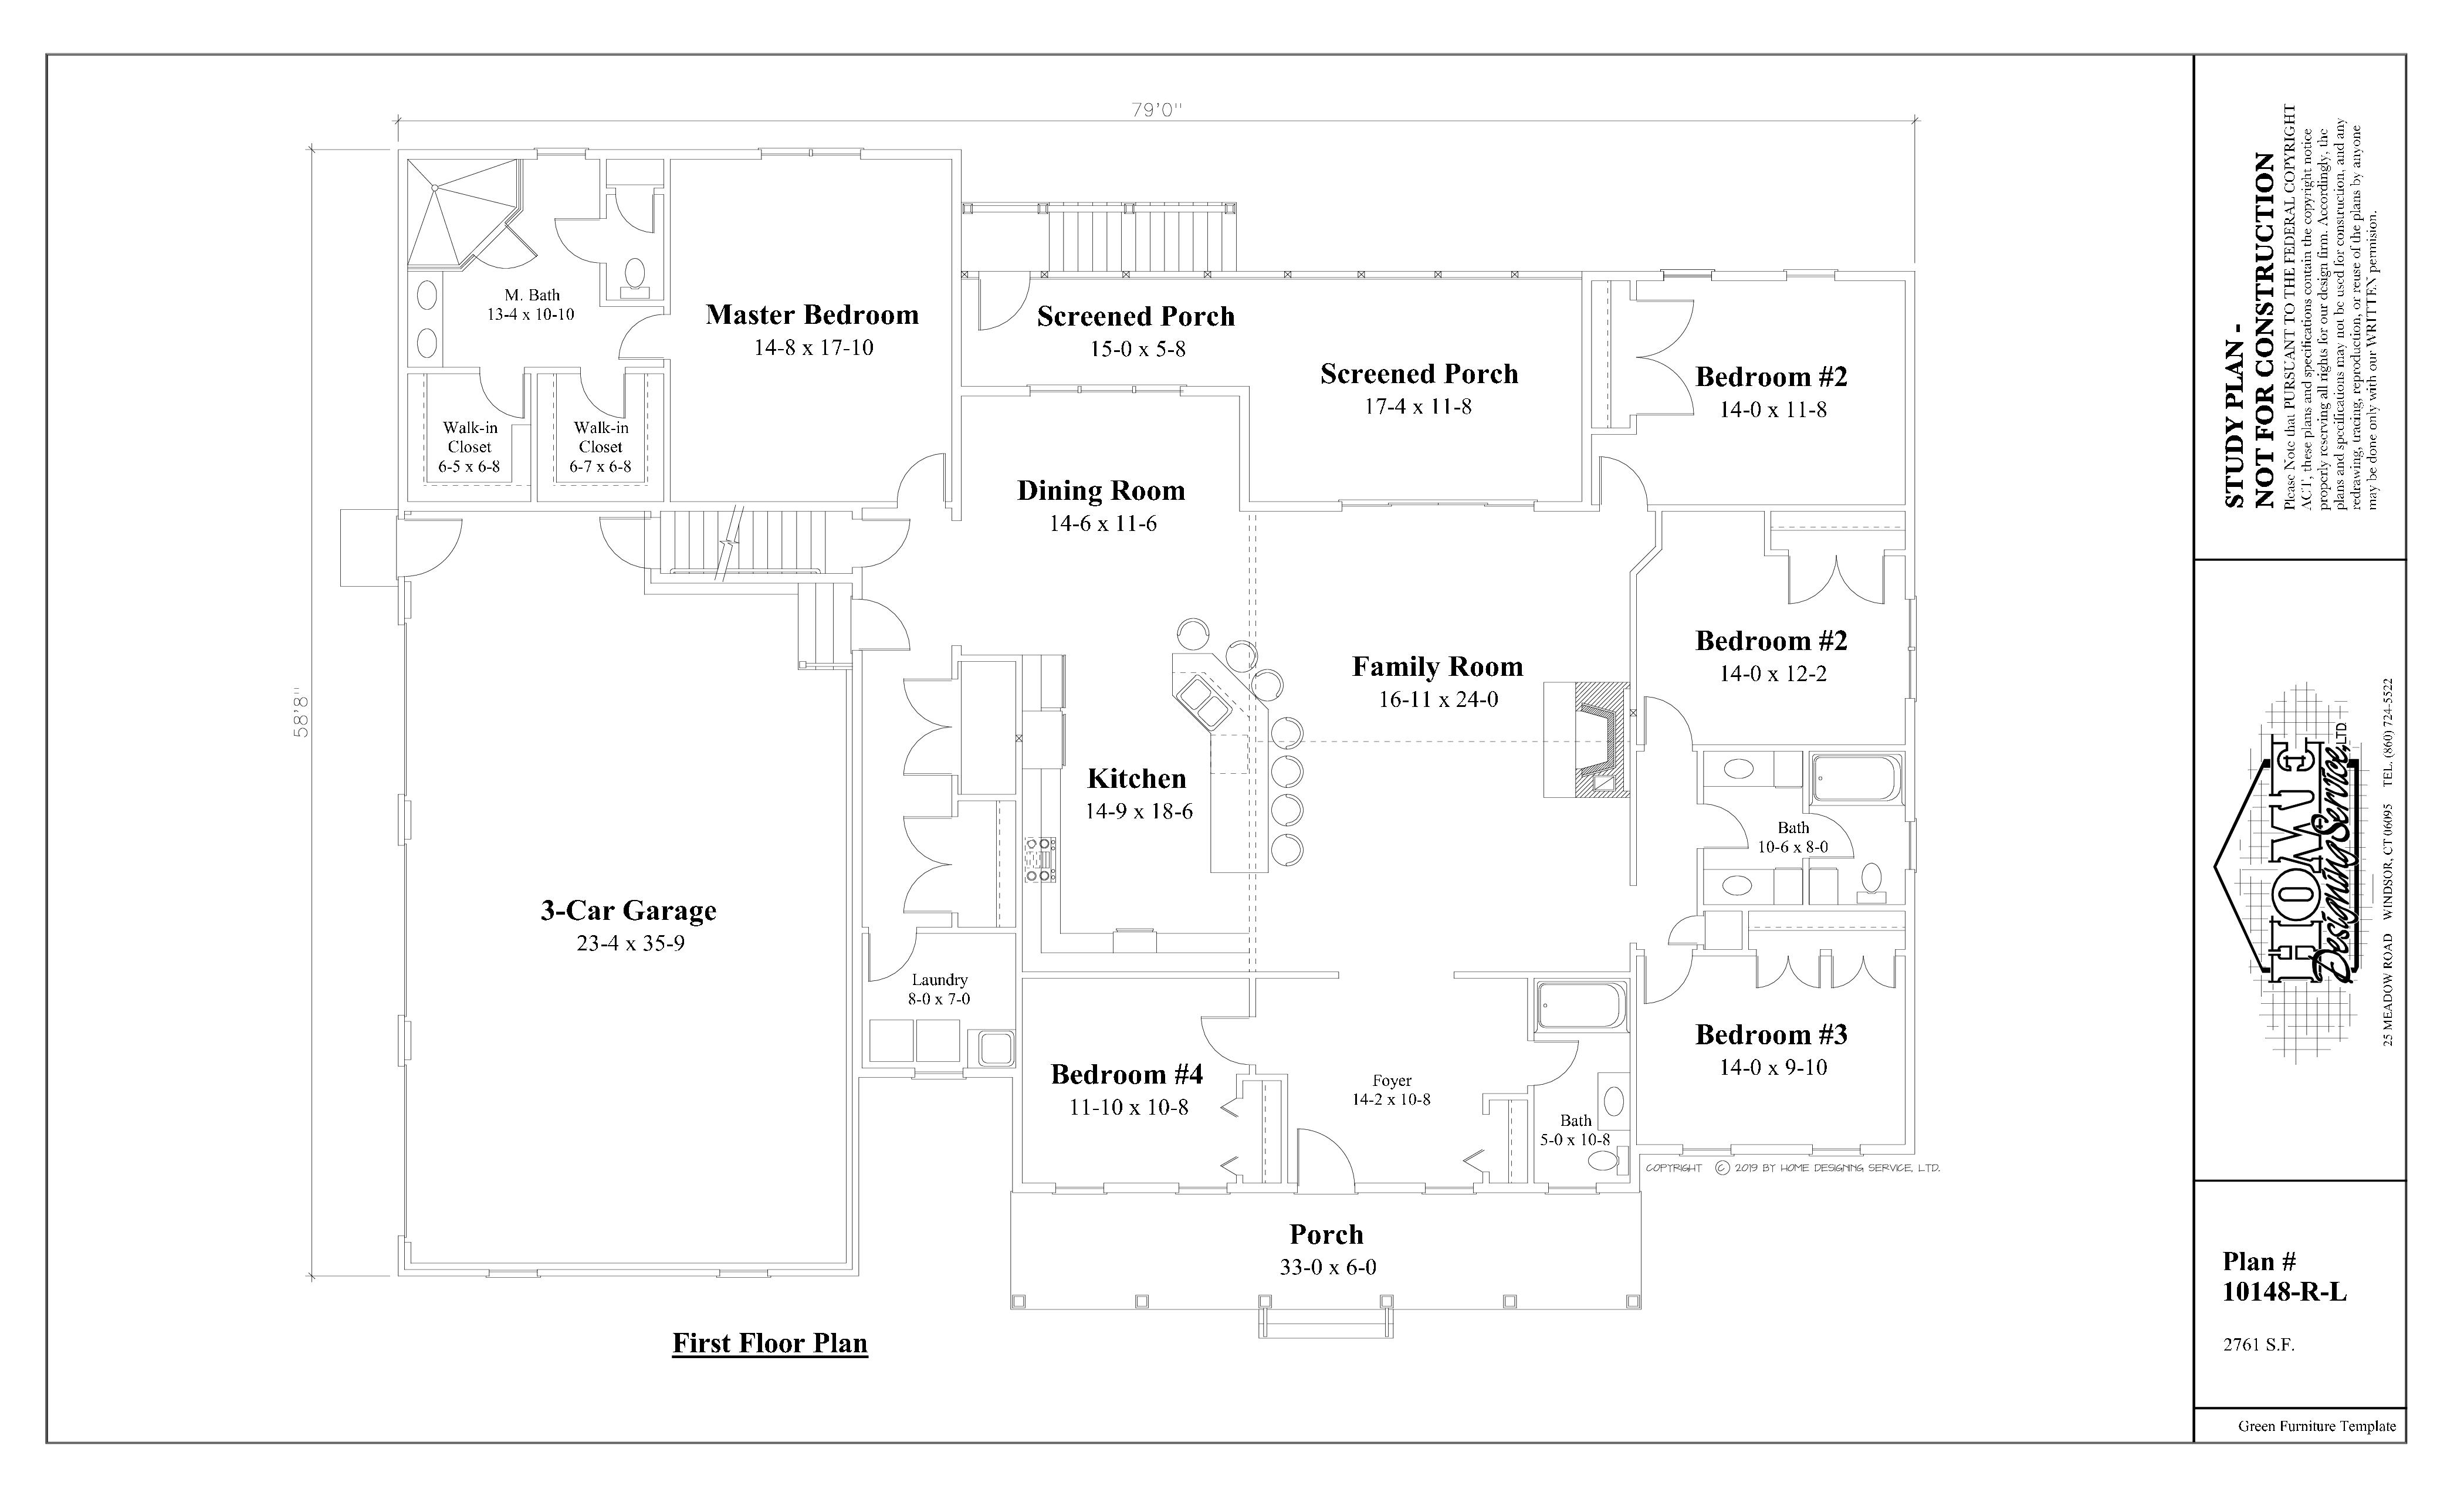 Ranch House Plan 10148-R-L - Home Designing Service Ltd.